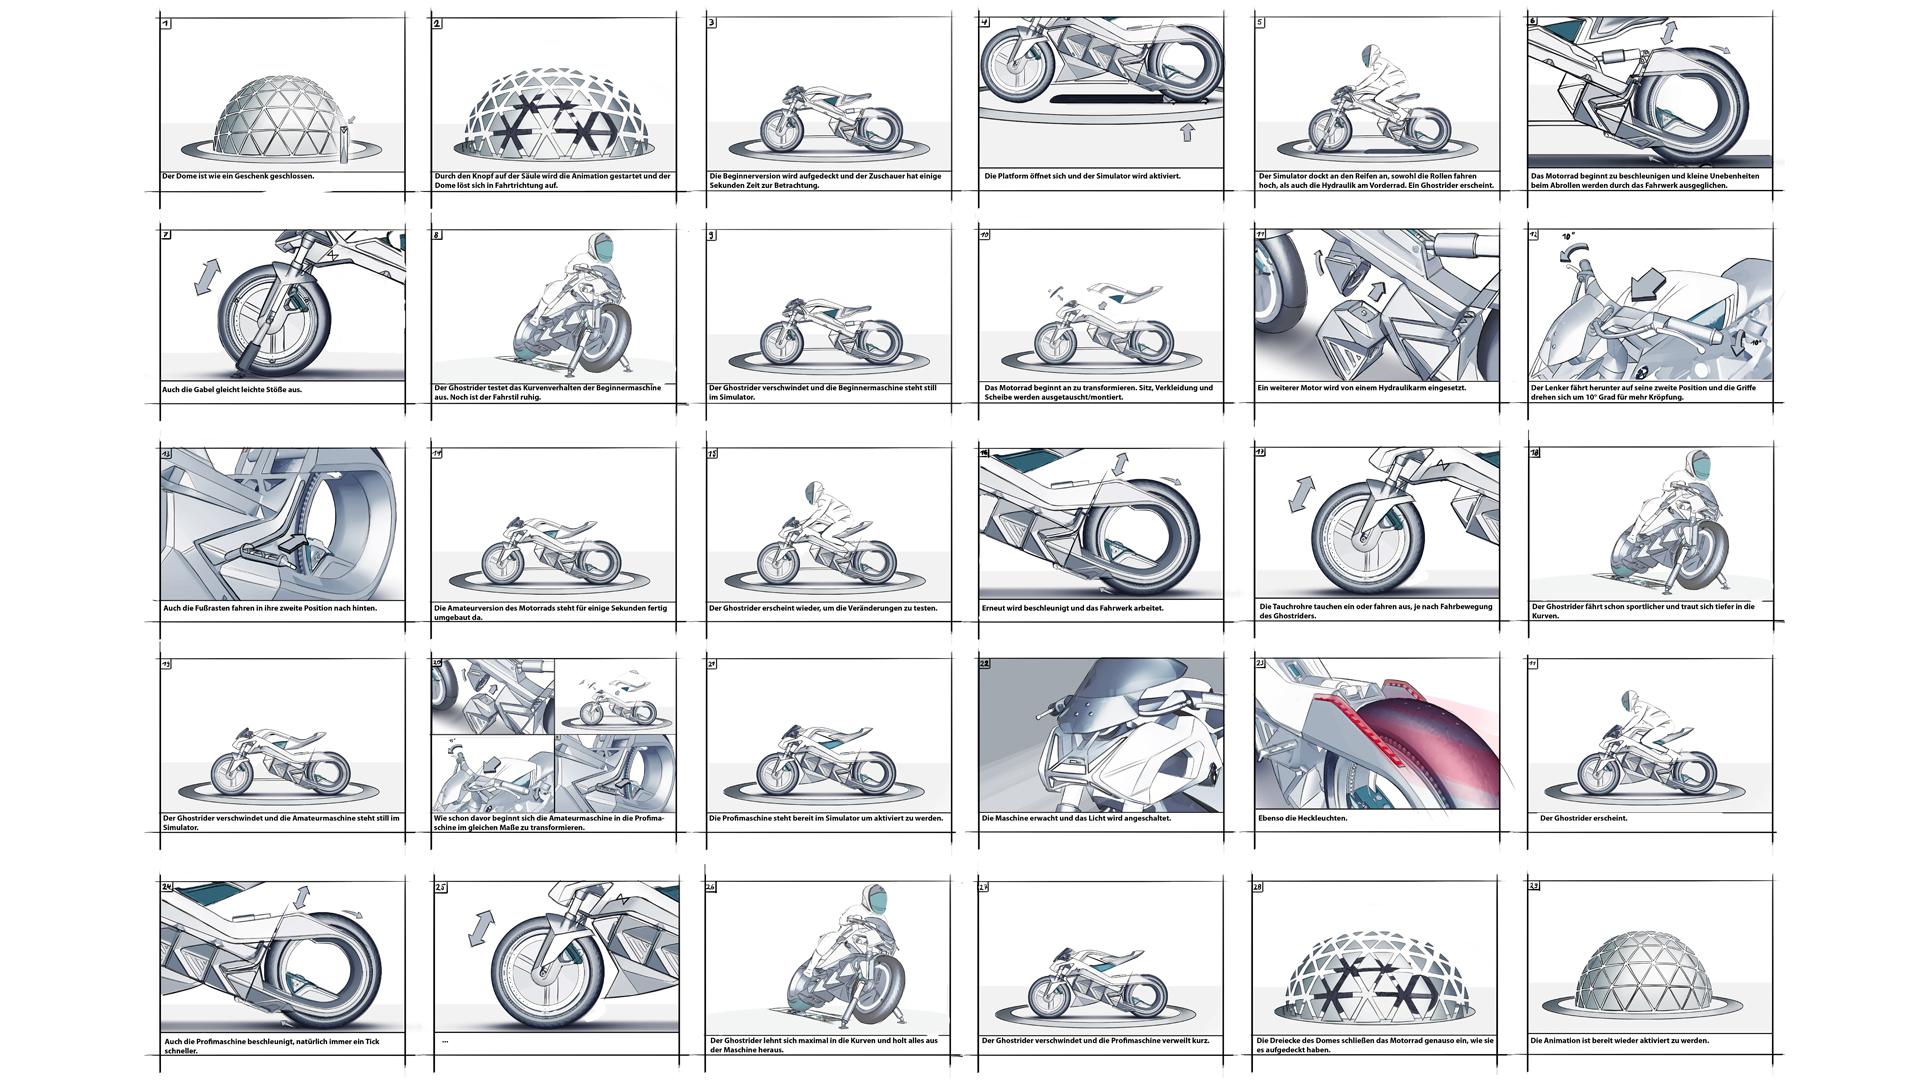 wp_design_bike_story-1